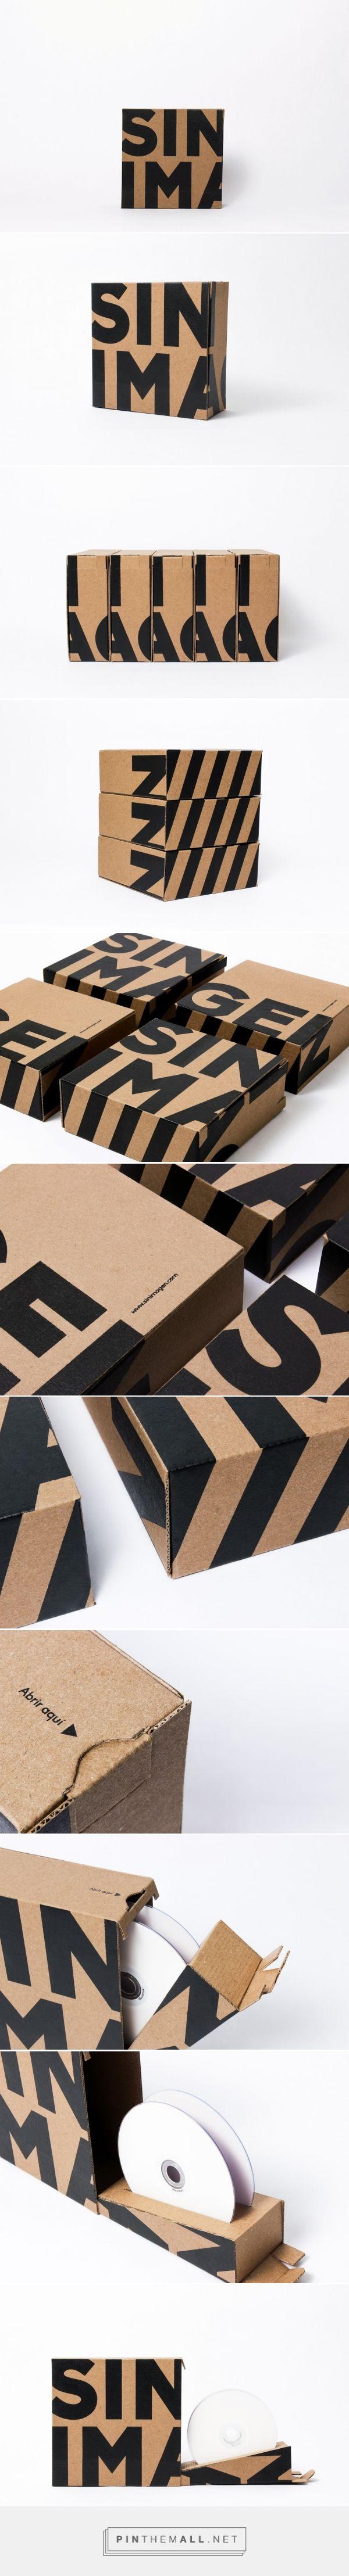 Sin Imagen #CD #Box designed by Ochodías (#Venezuela) - http://www.packagingoftheworld.com/2016/03/sin-imagen-cd-box-concept.html